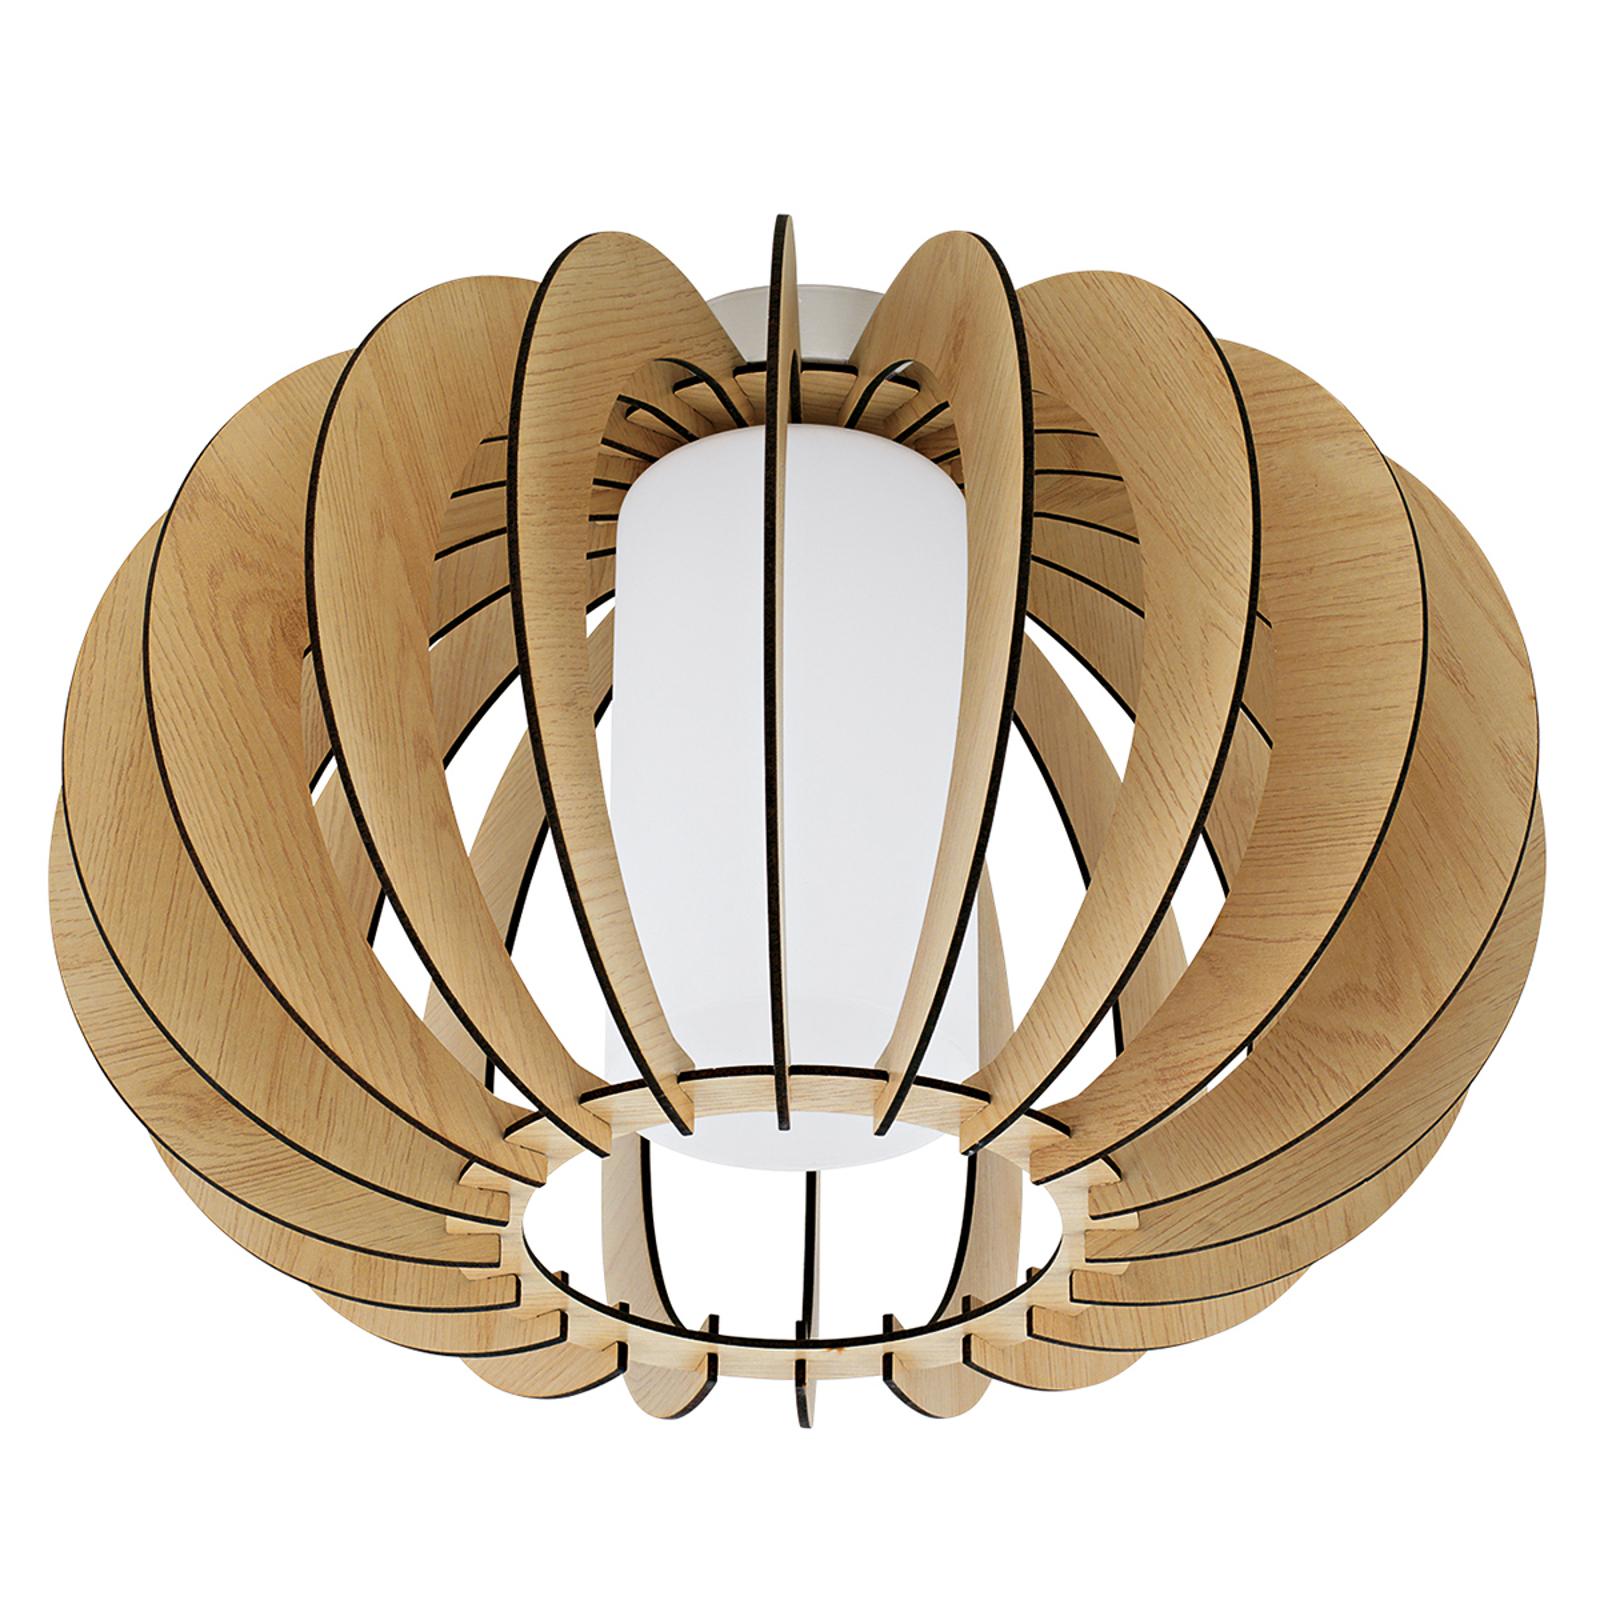 Stellato loftlampe i naturligt udseende